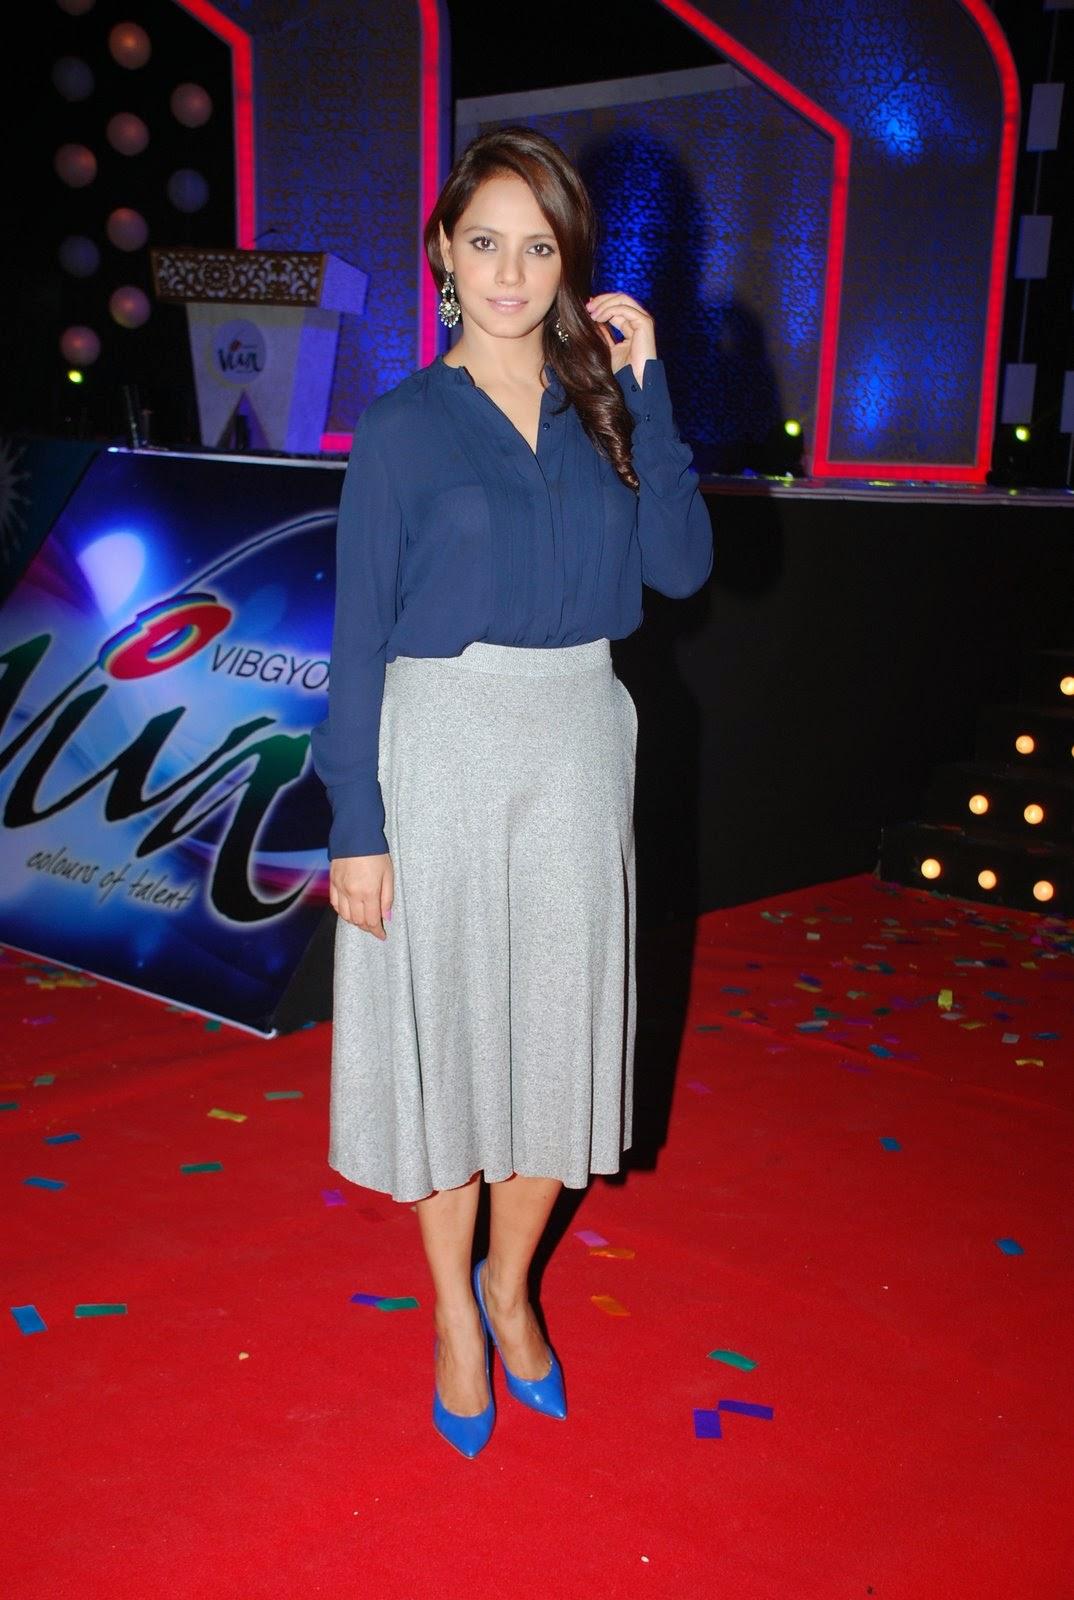 Neetu Chandra attends Vibgyor School Annual Celebration Stills